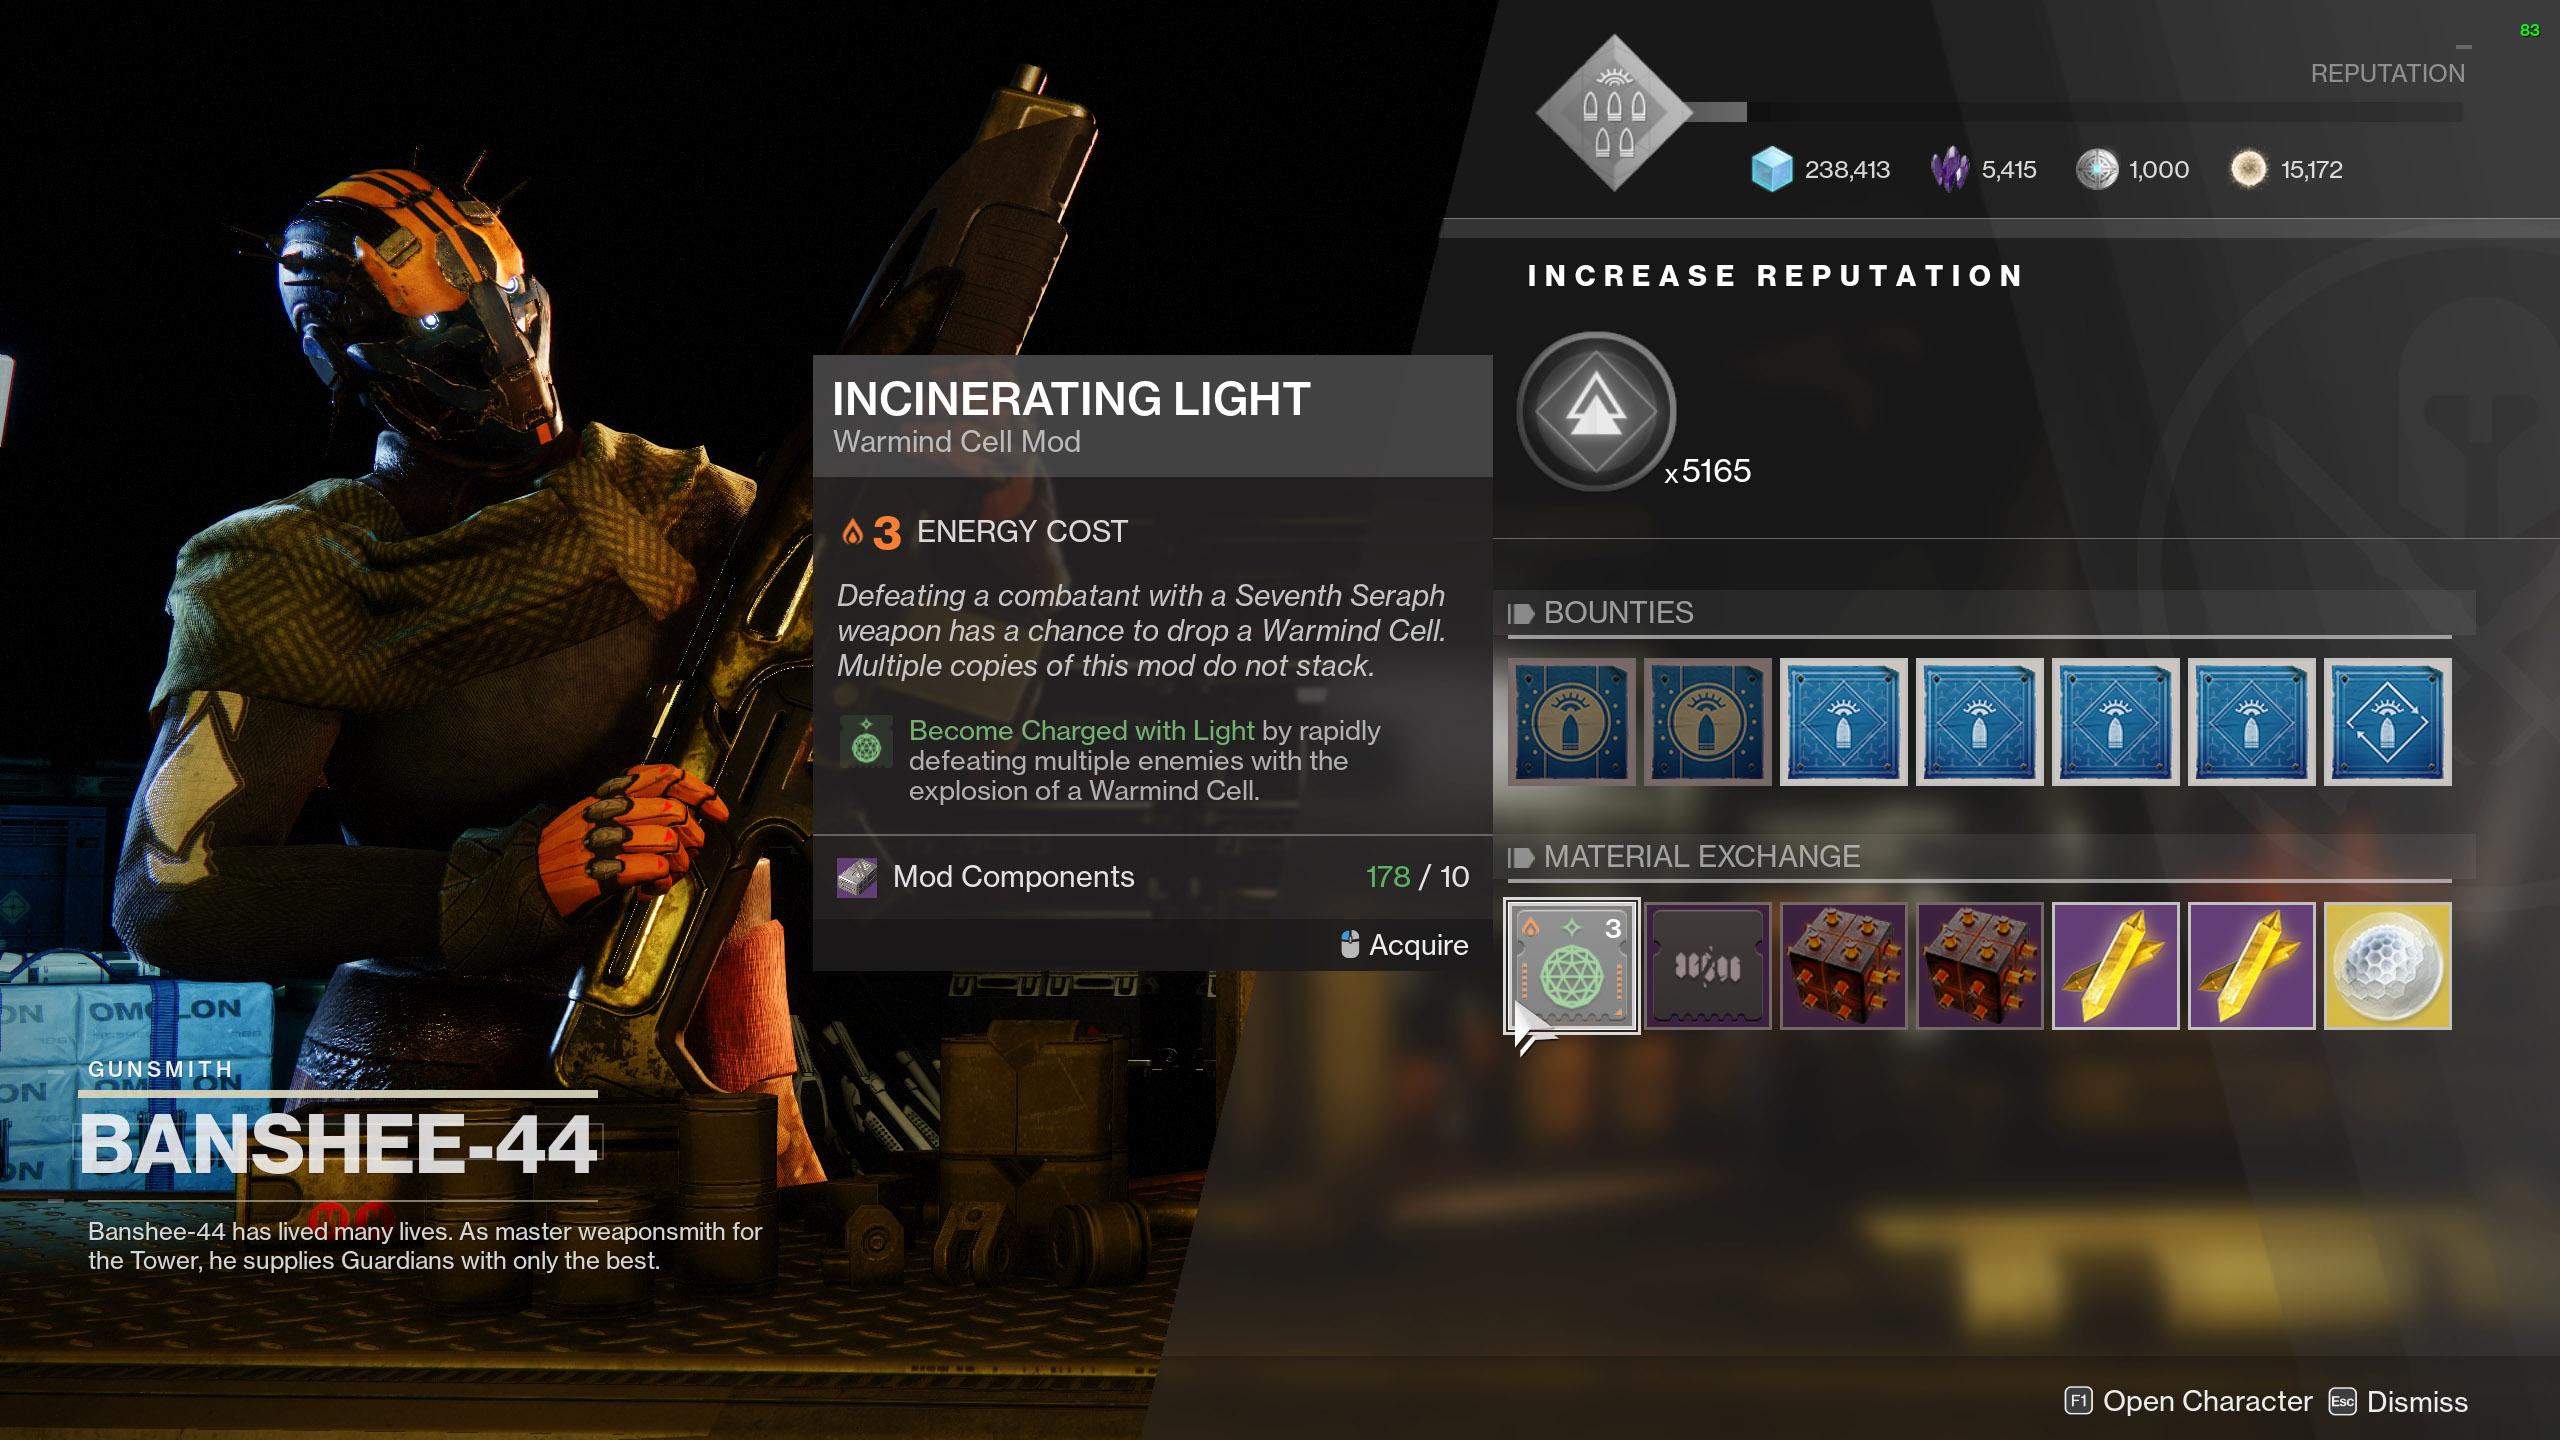 destiny 2 use mod components armor mods